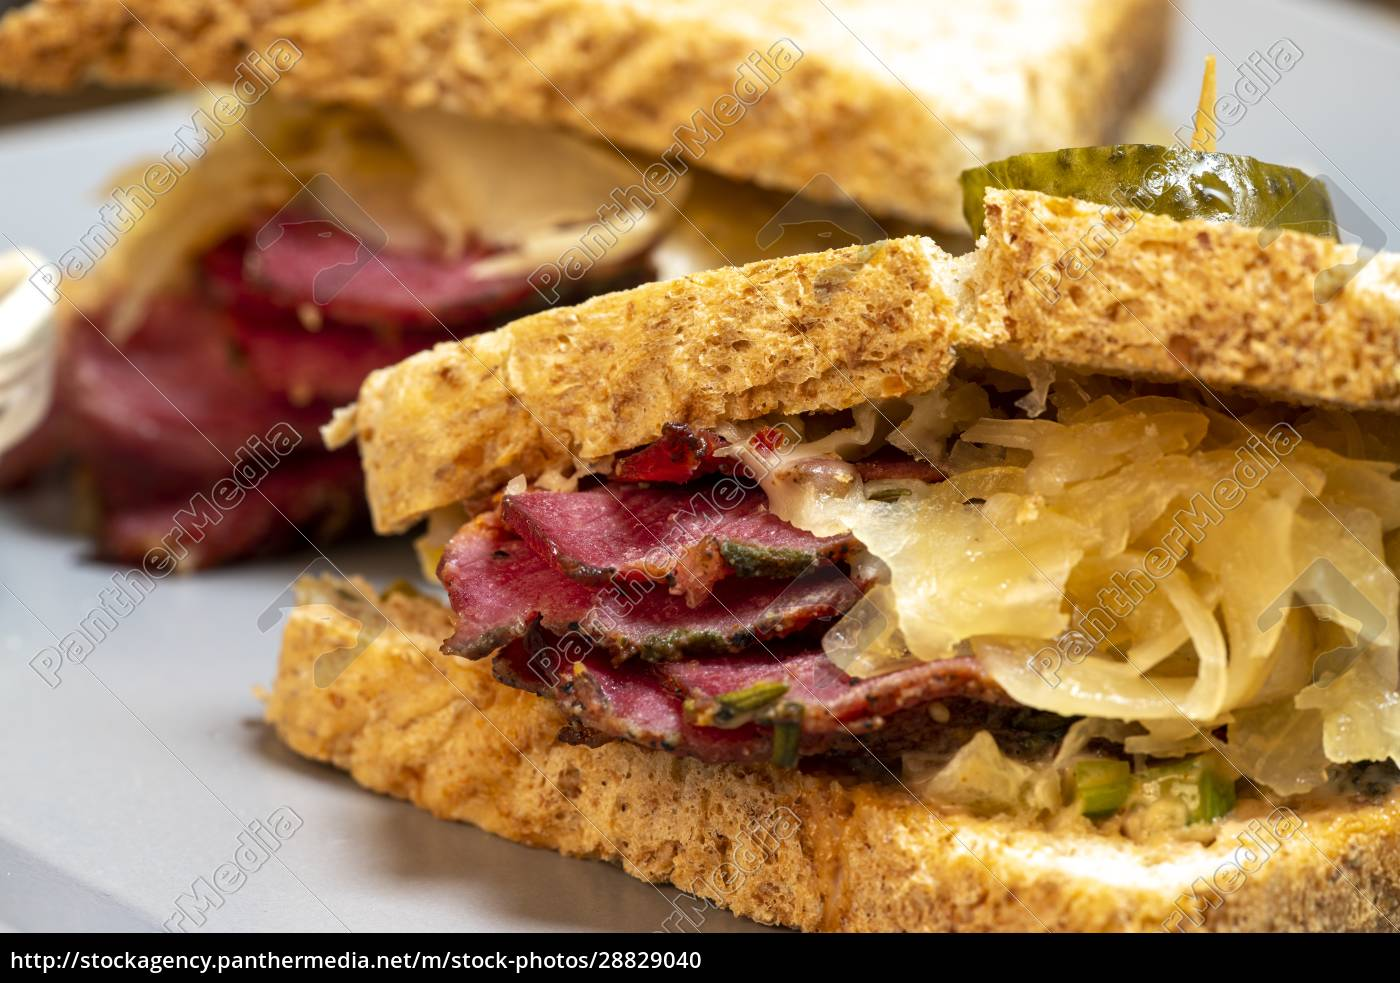 reuben, sandwich - 28829040